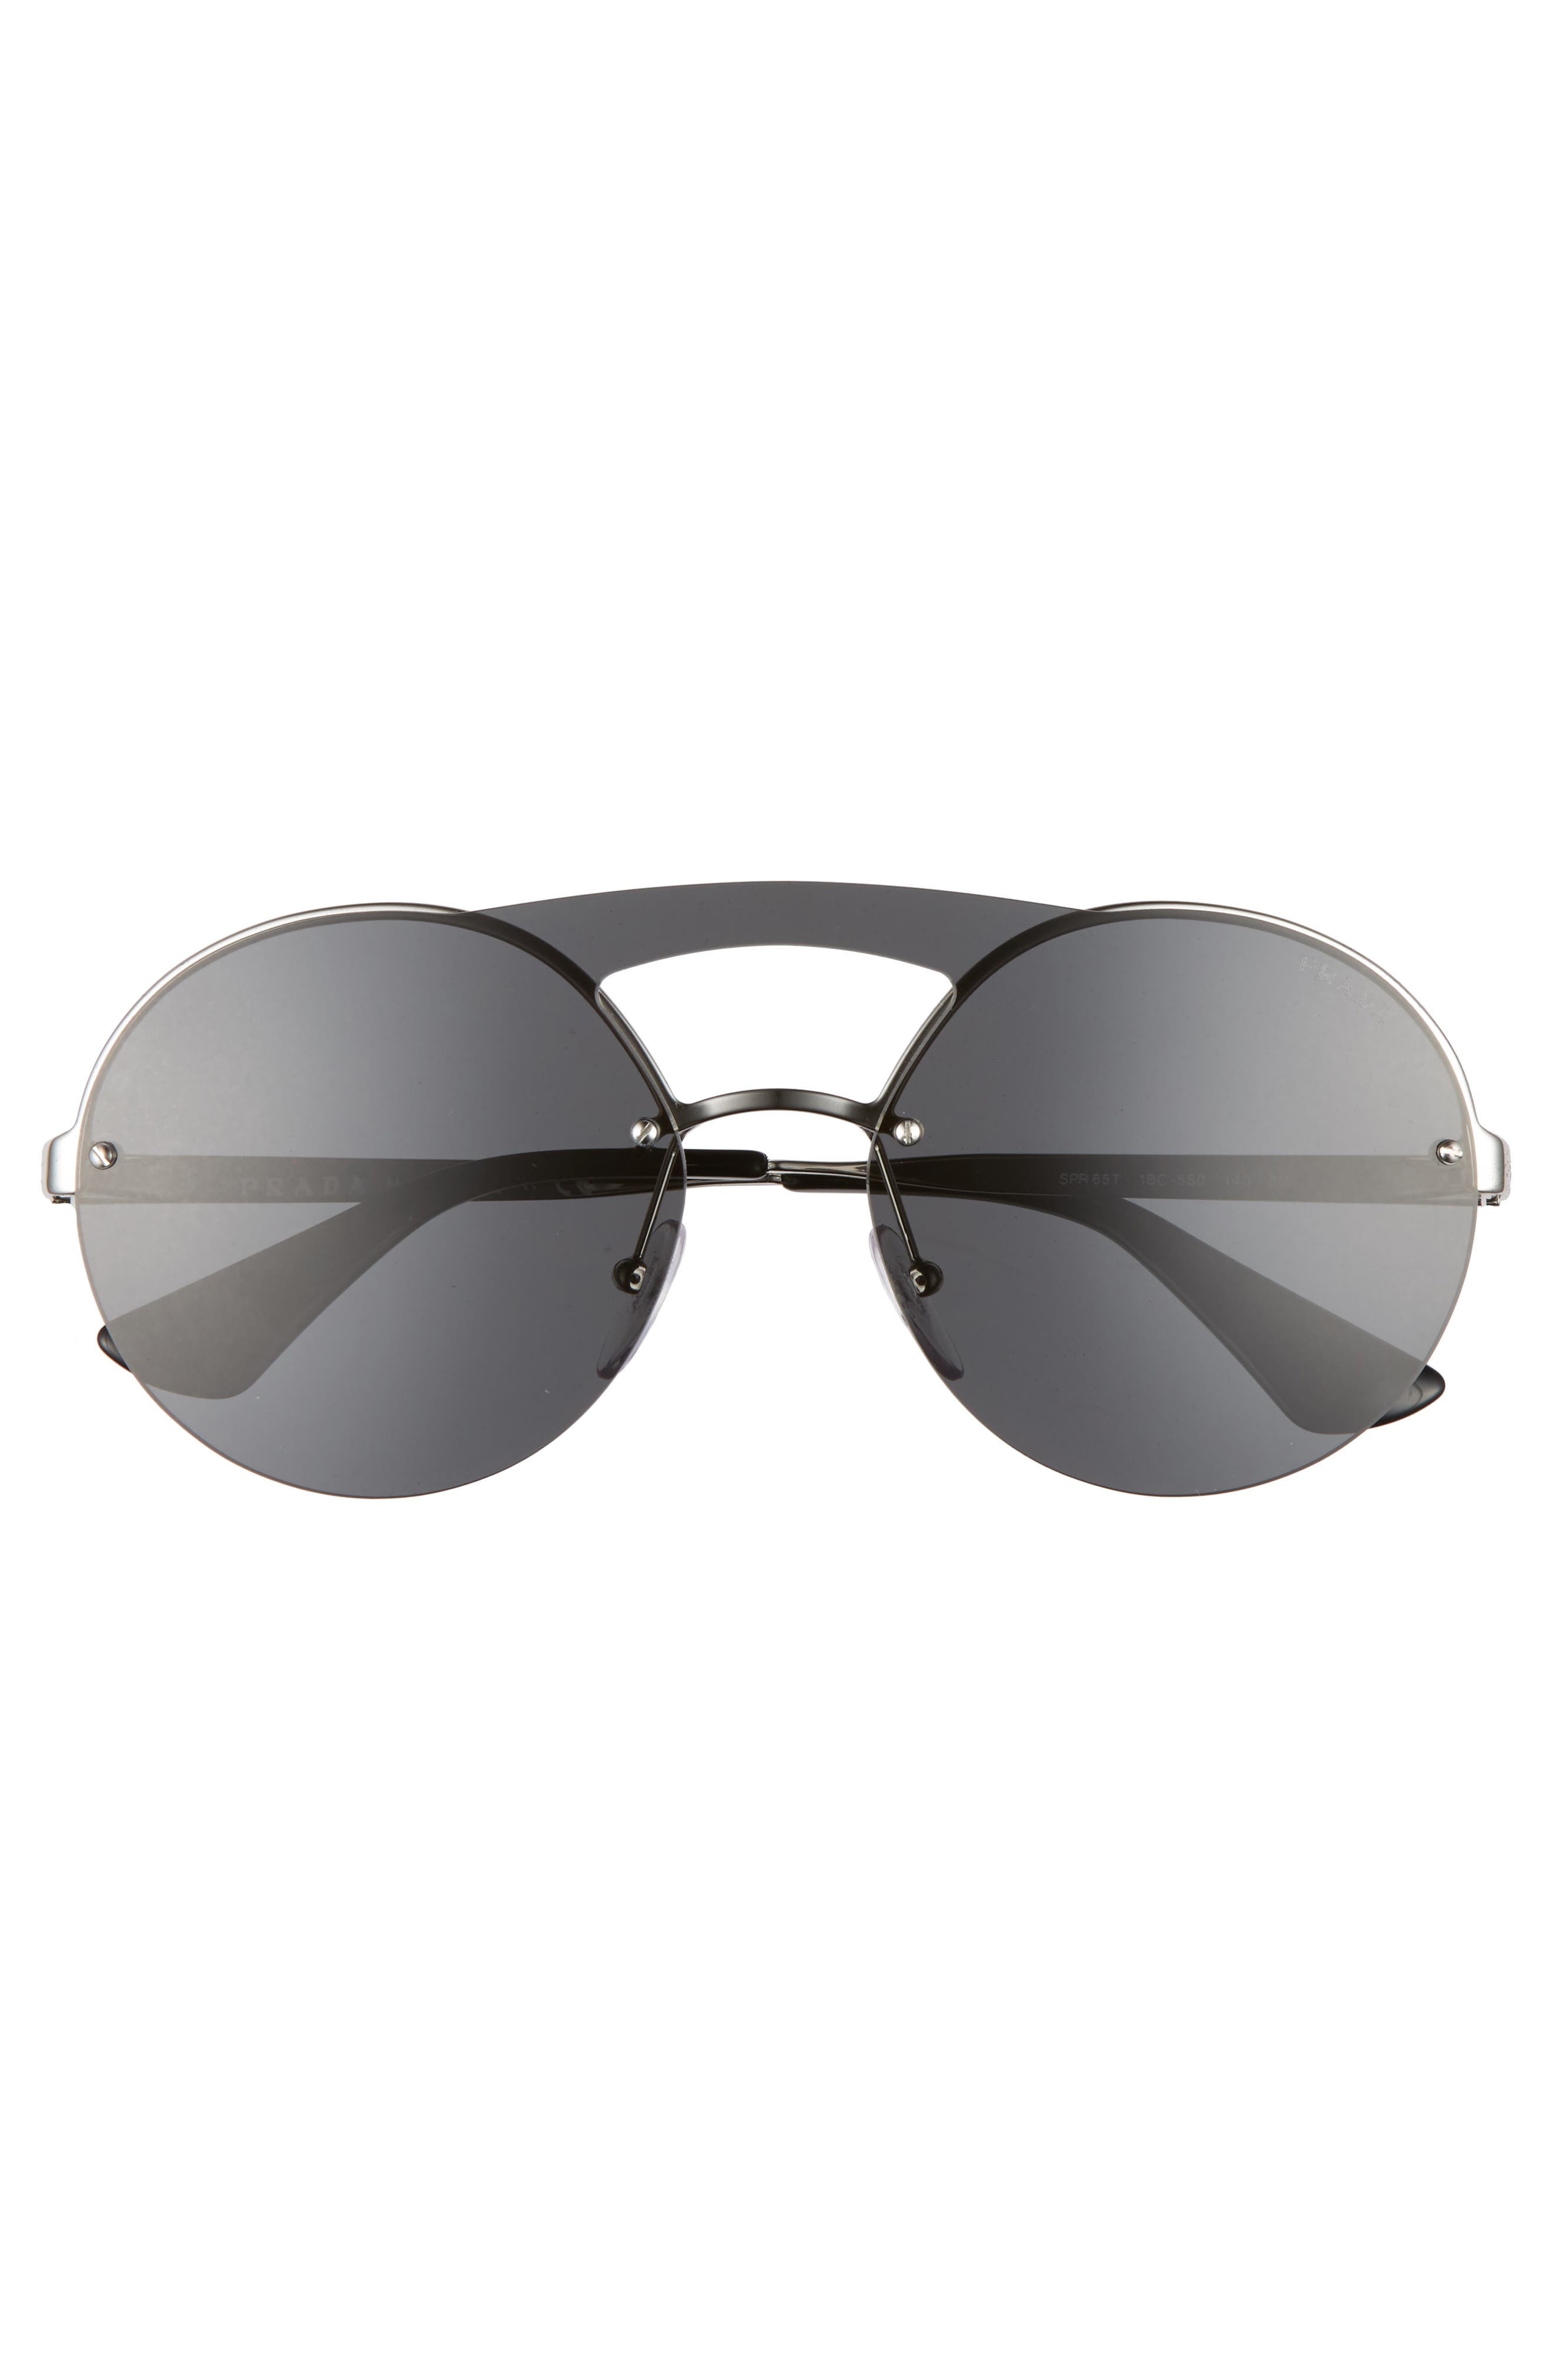 60mm Round Rimless Sunglasses,                             Alternate thumbnail 3, color,                             020